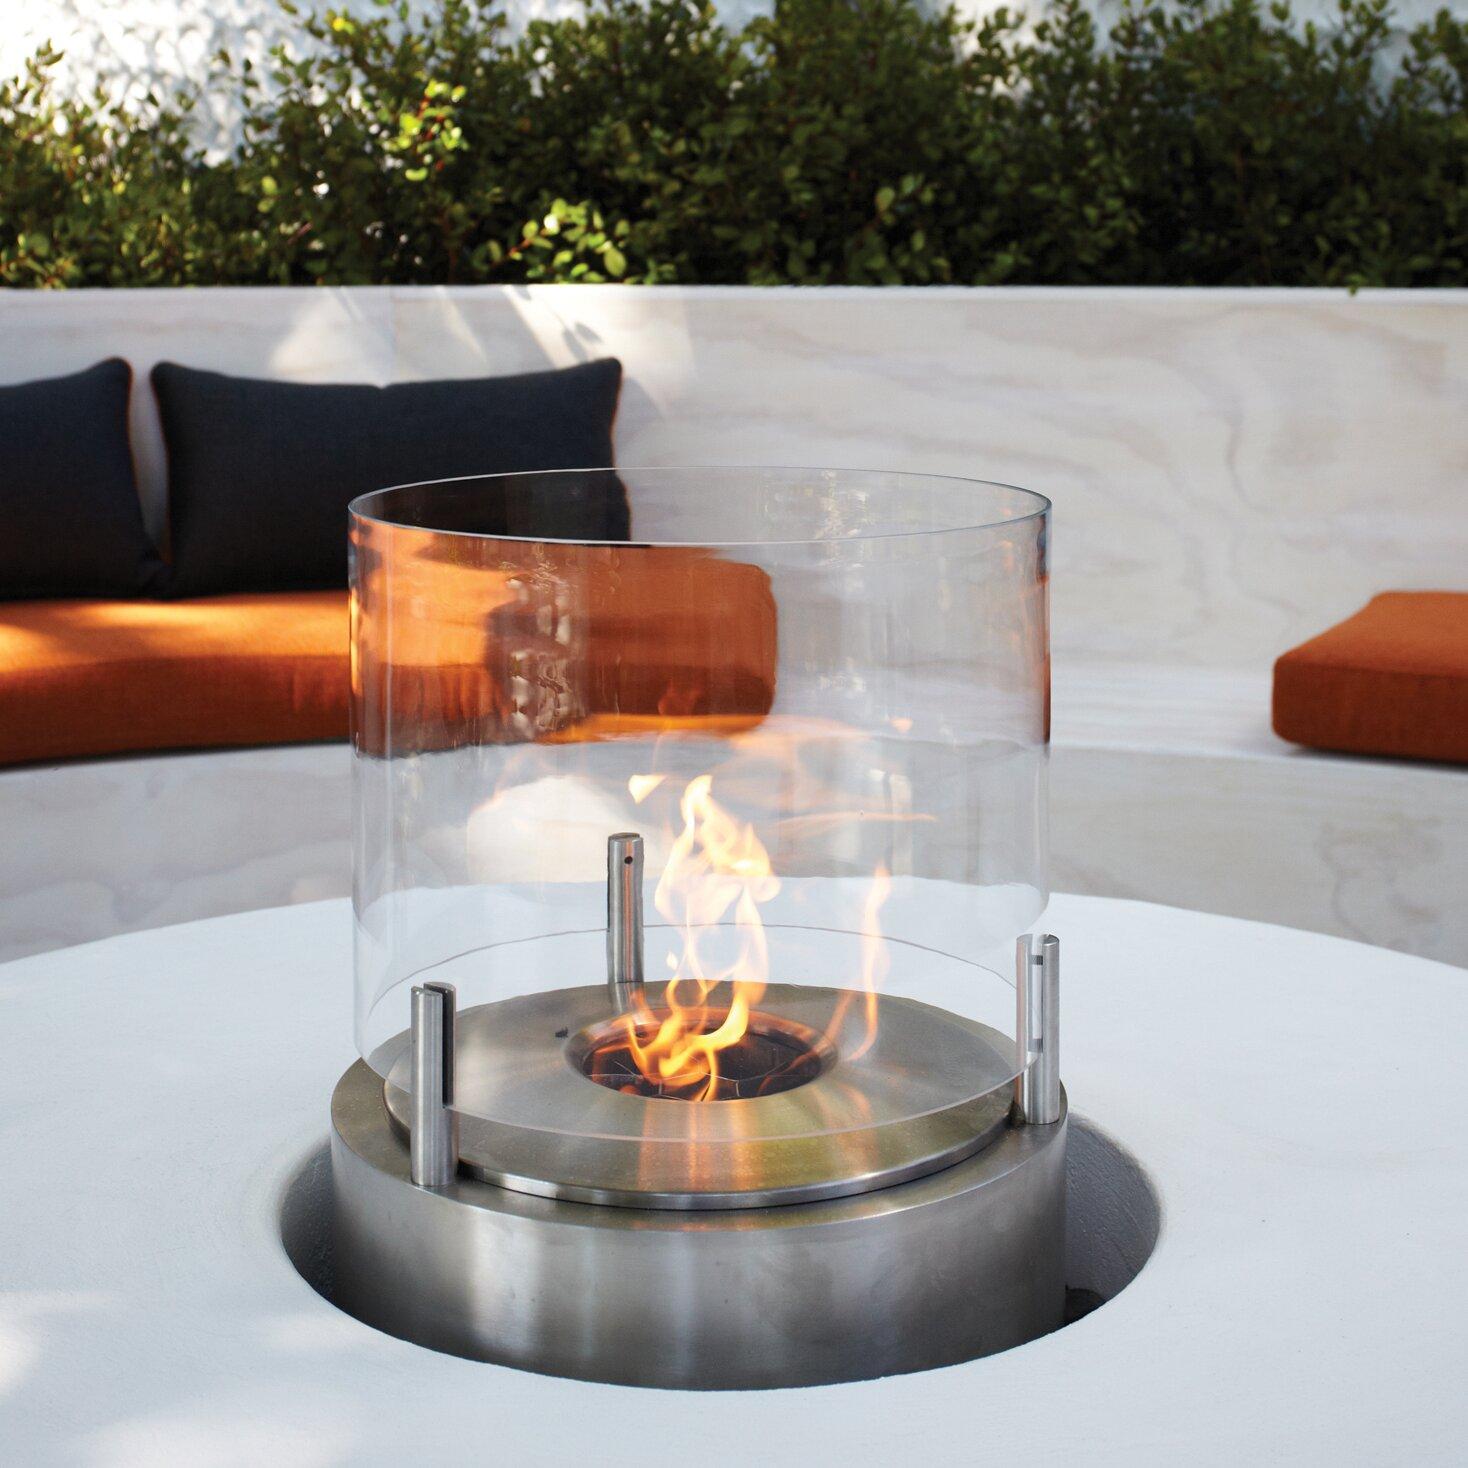 EcoSmart Fire Cyl Bio-Ethanol Tabletop Fireplace - EcoSmart Fire Cyl Bio-Ethanol Tabletop Fireplace Wayfair